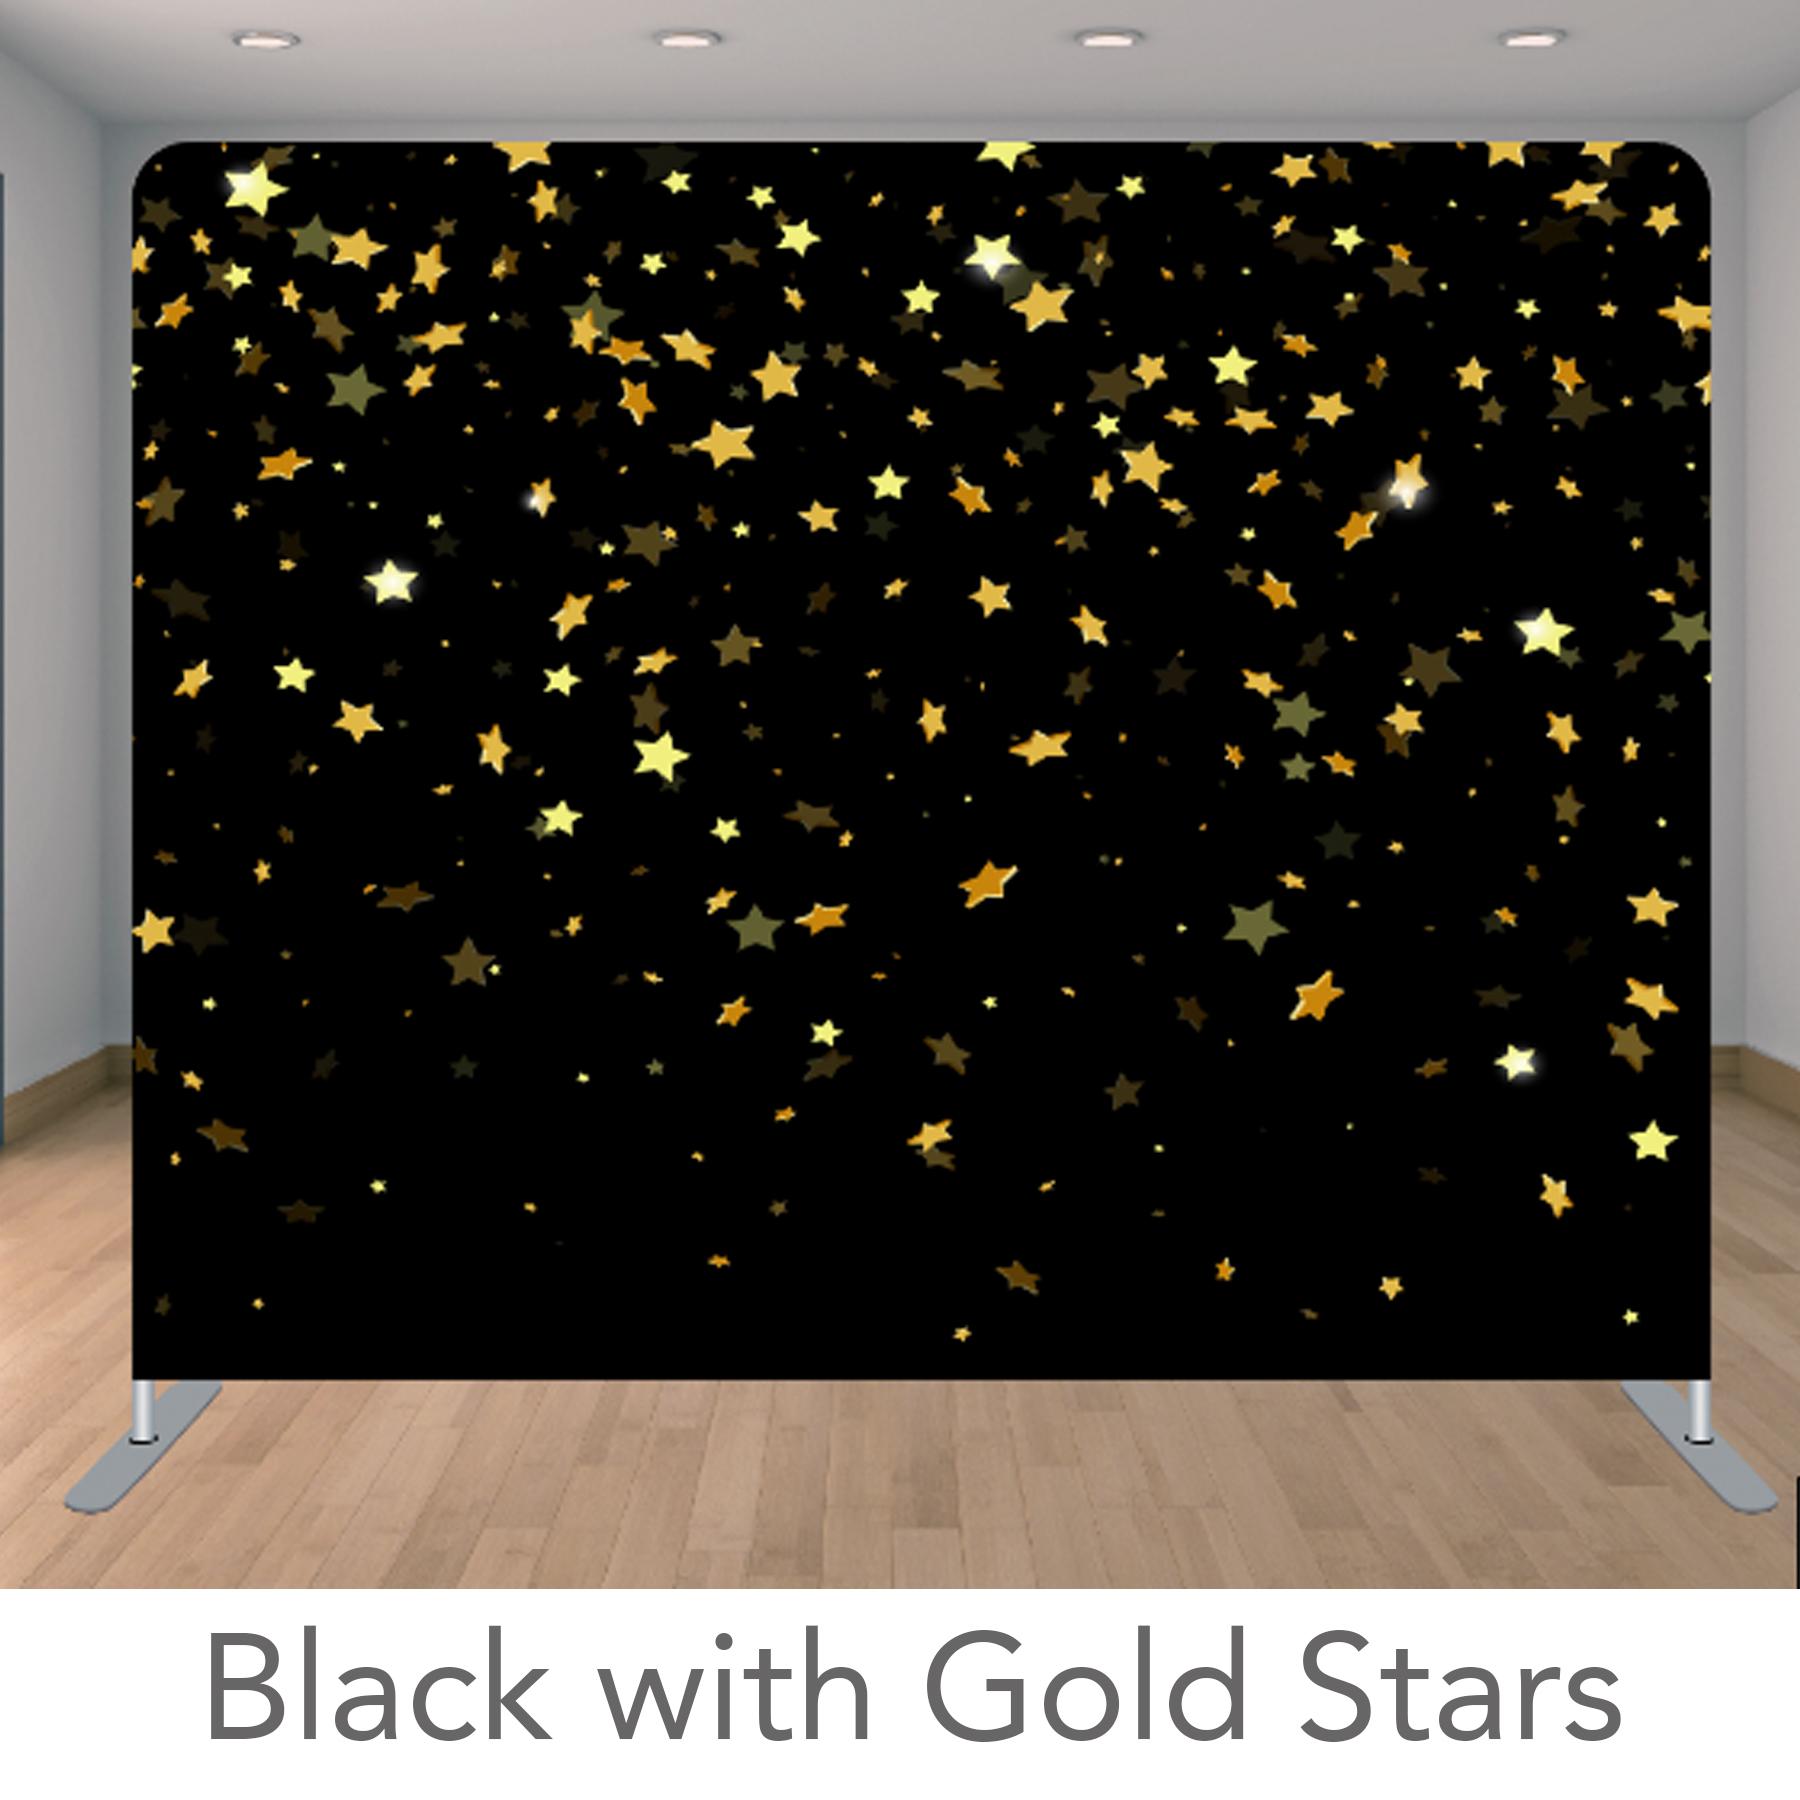 BlackwithGoldStars.jpg